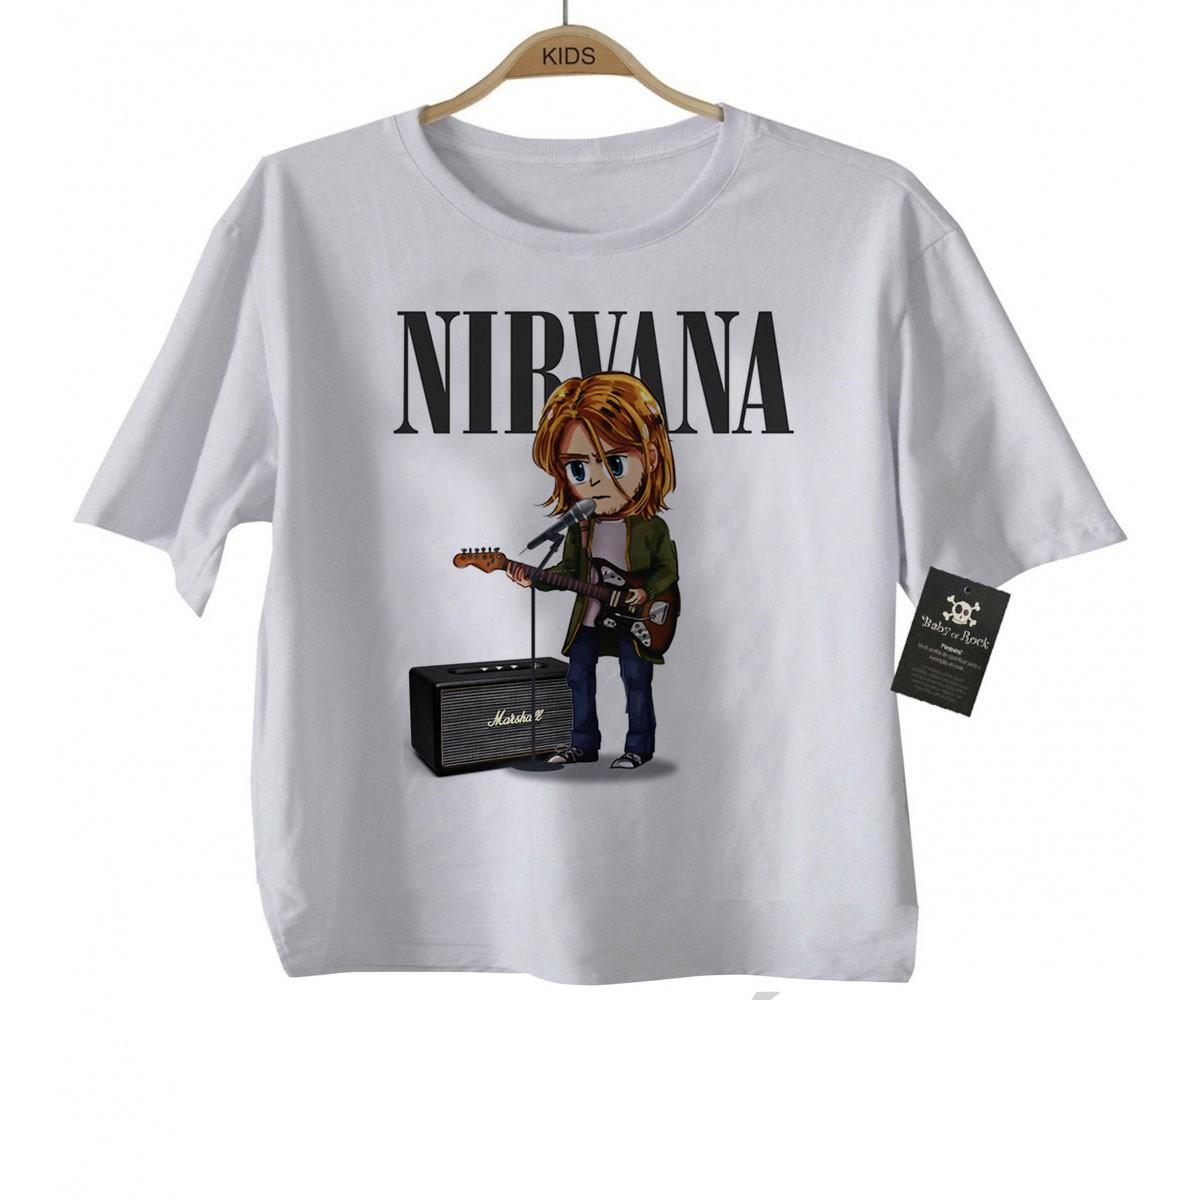 Camiseta Infantil  Nirvana Anime 3d - Estampa Animada  - Baby Monster S/A